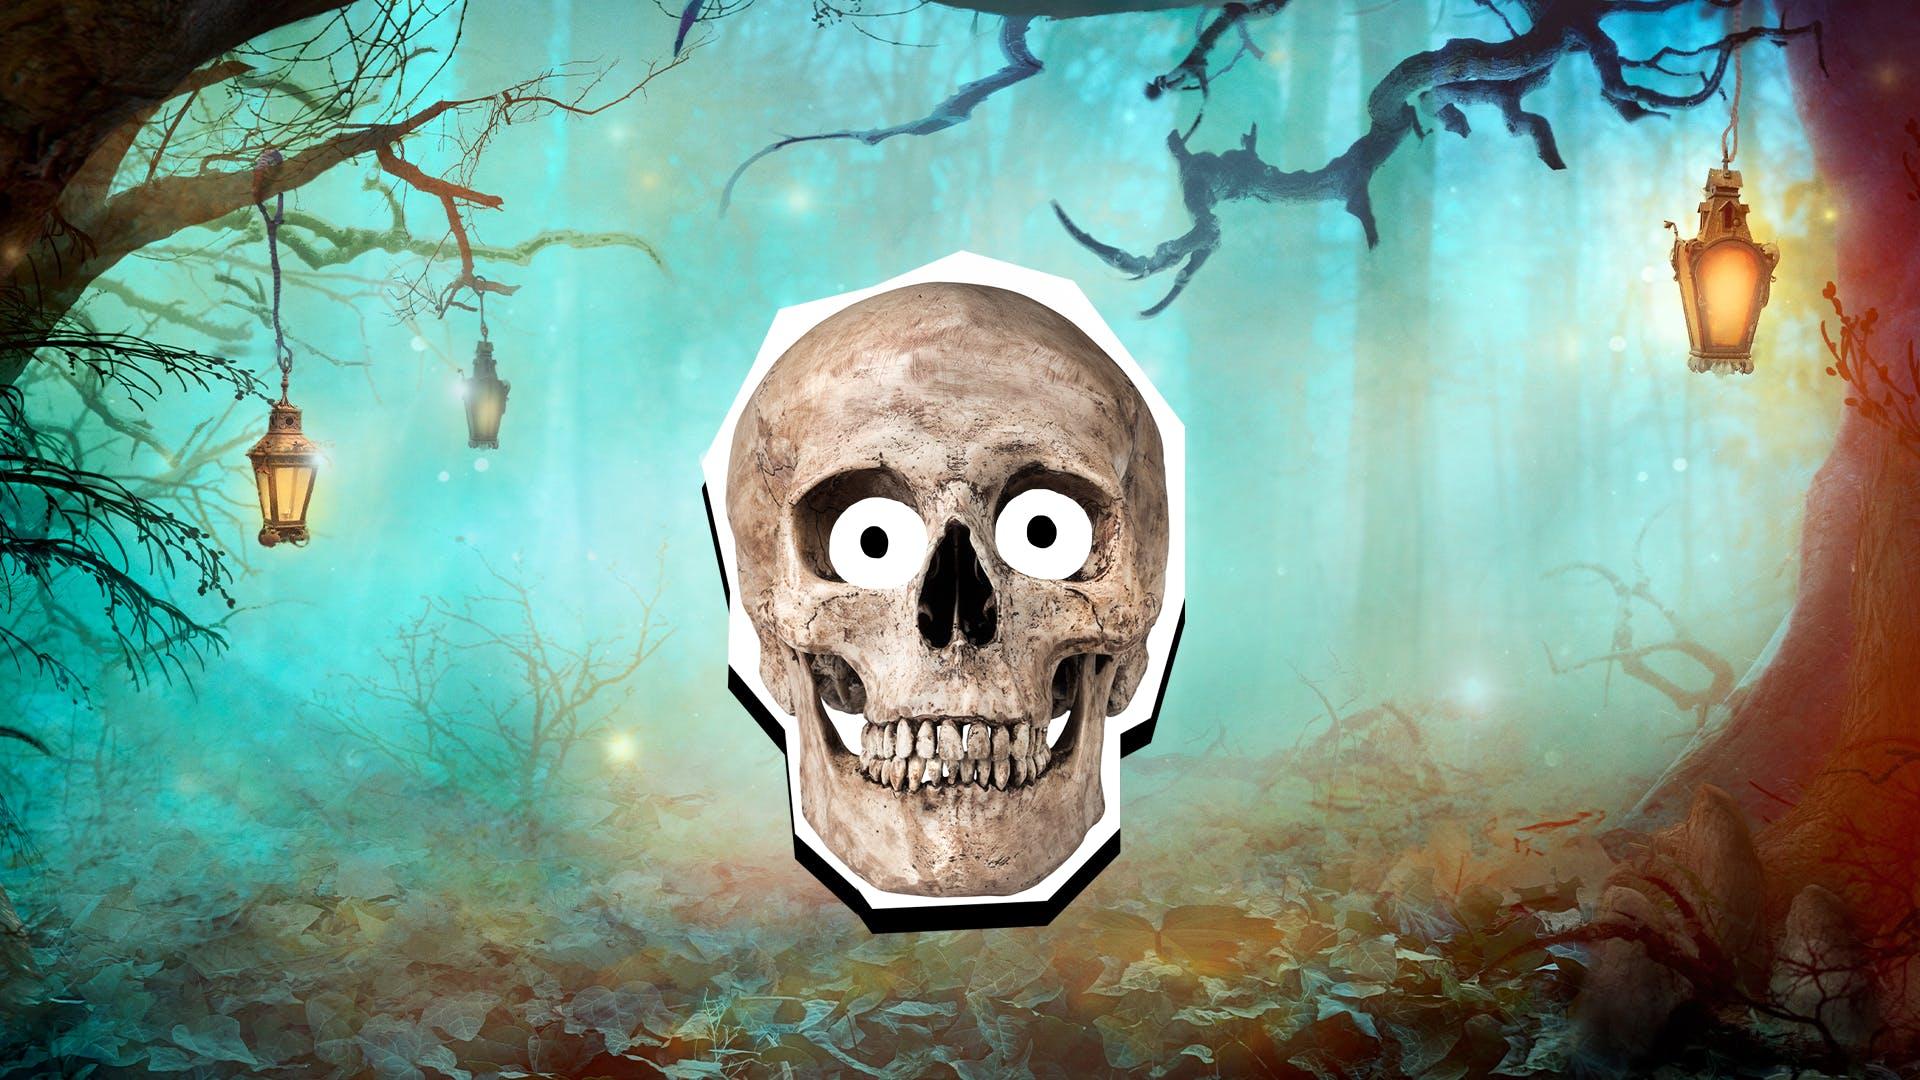 A smiling skull